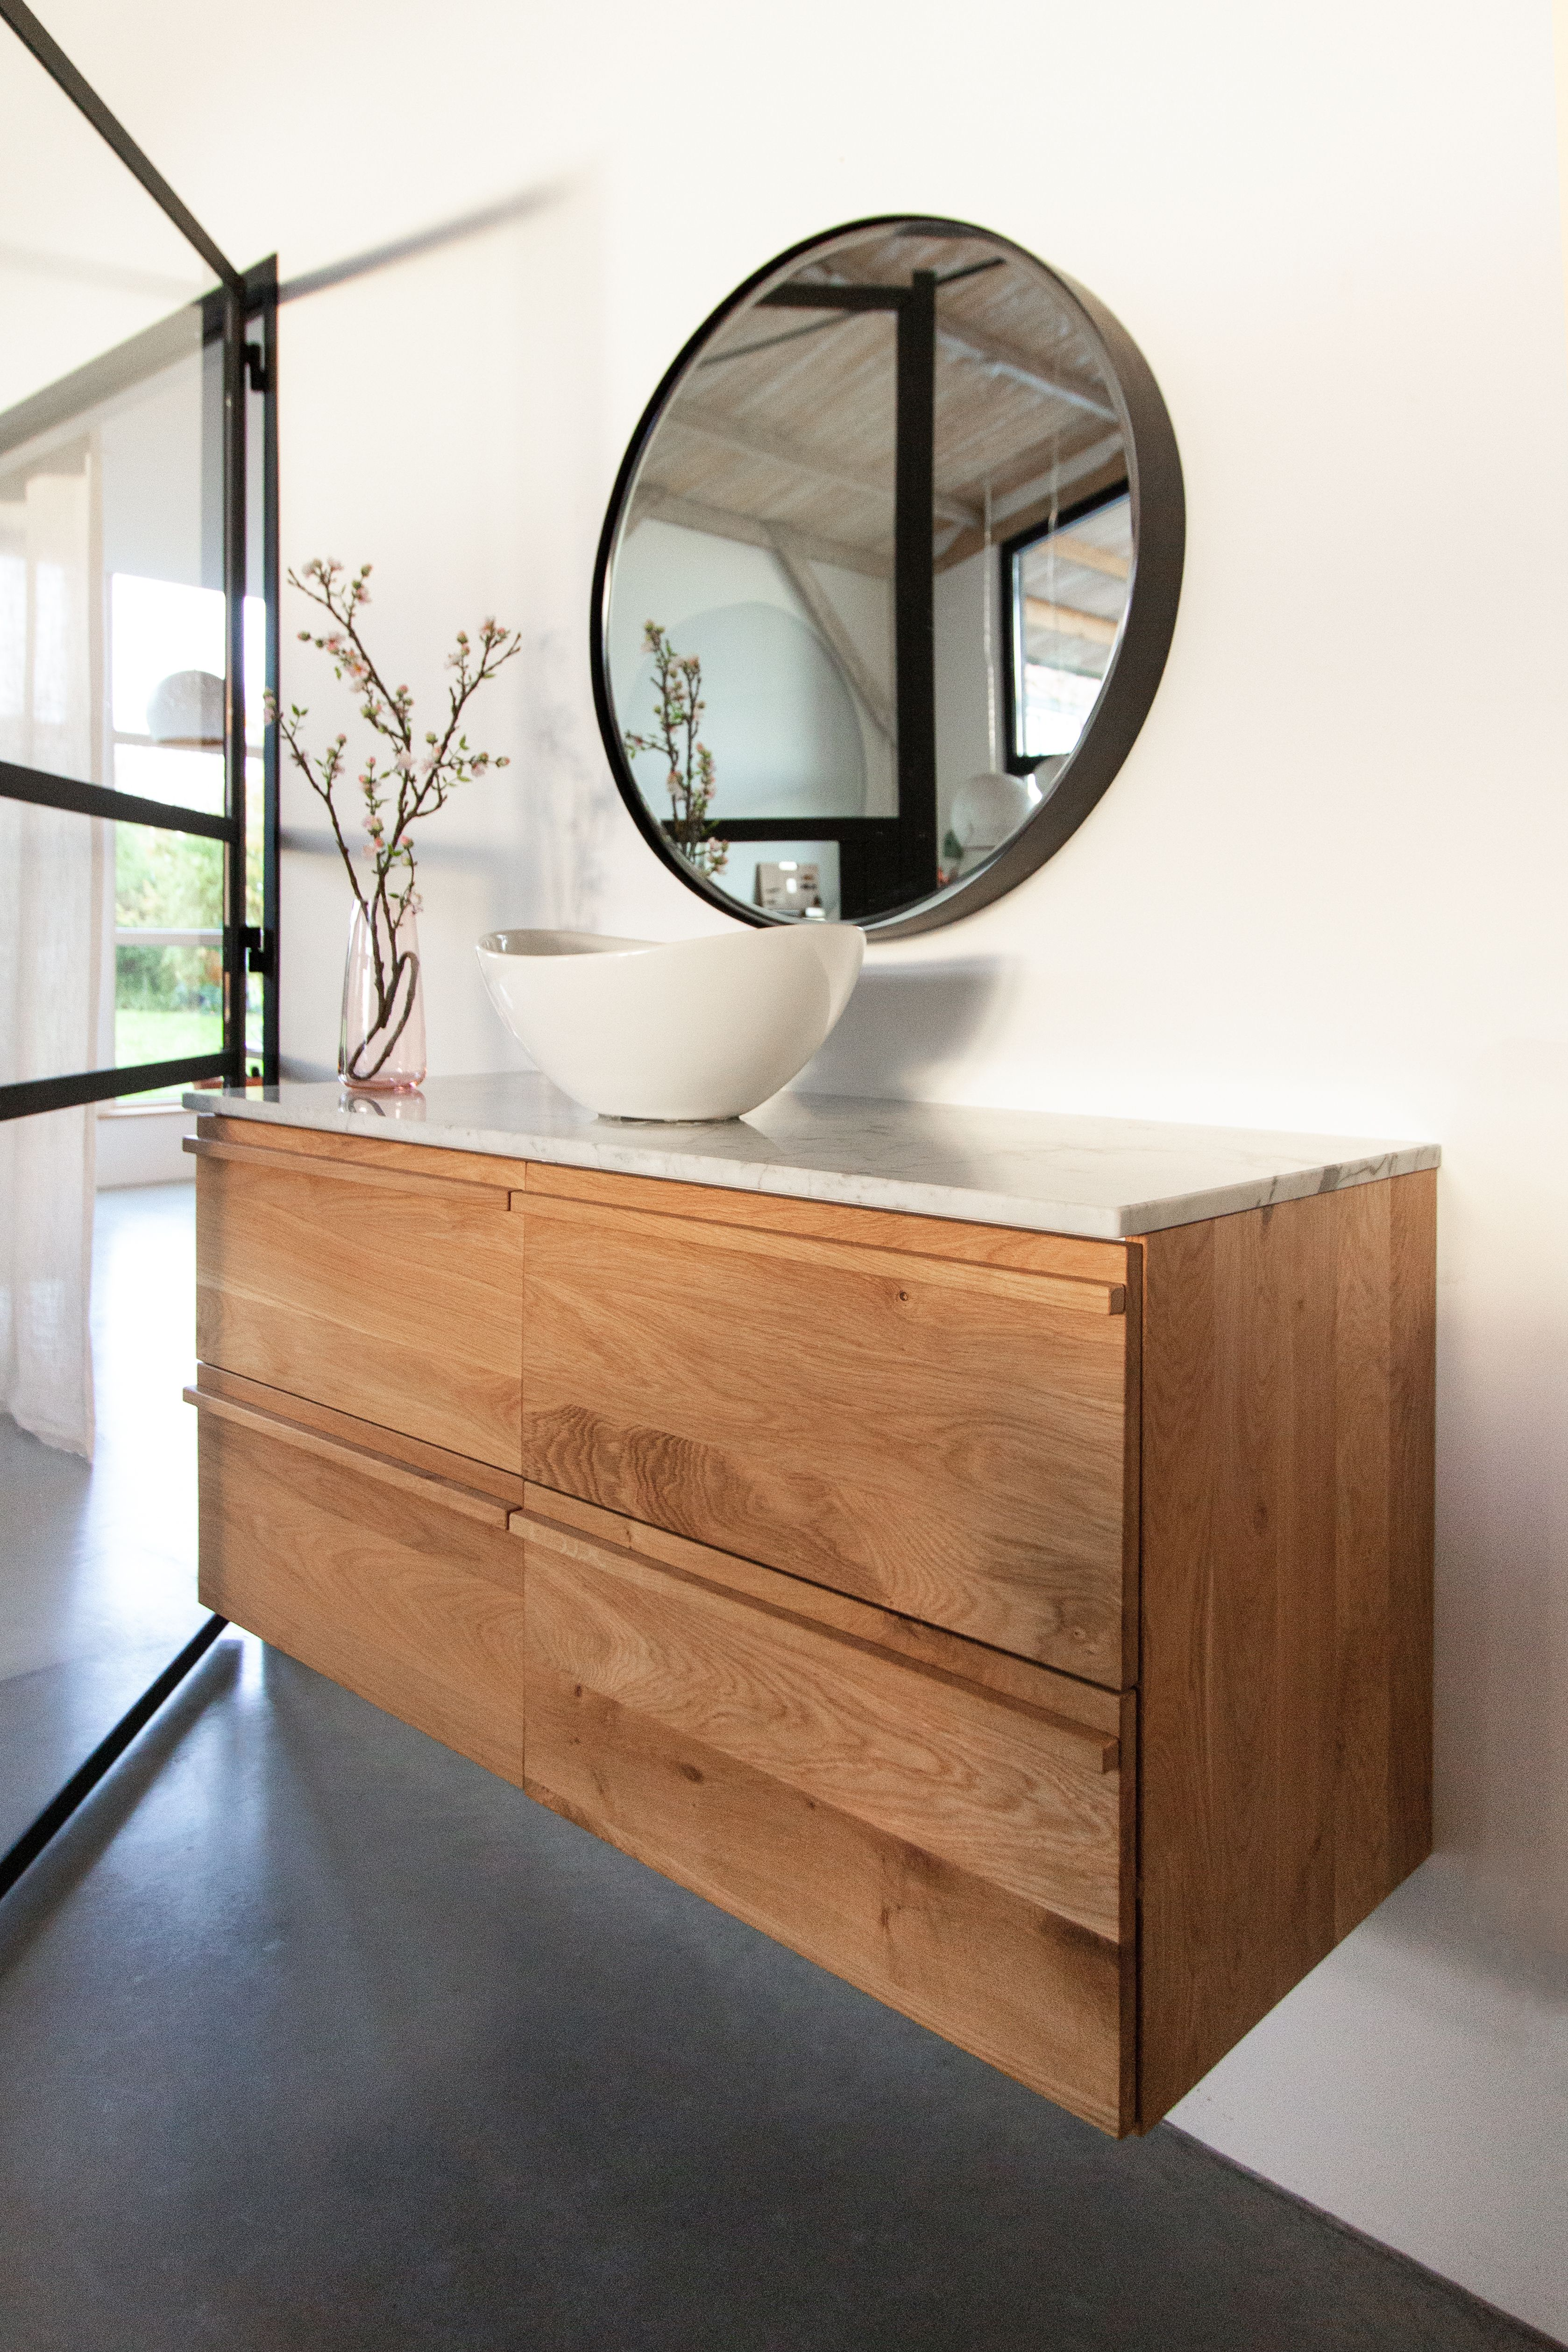 #Godmorgon #KoakDesign #BathroomFurniture #industrialbathroom #Industrialstyle #Industrialfurniture #Pimpyourbathroom #Bathroomideas #BathroomRestyle #BathroomRemodel #IkeaNederland #Ikea #Ikeahack #Dreambathroom #Bathroominspiration #BathroomRenovation #OakDesign #Marble #Marbletop #SteelDetails #BlackDetails #BathroomStyle #conceptiondesalledebain #Badgestaltung #Koak #oak #Architect